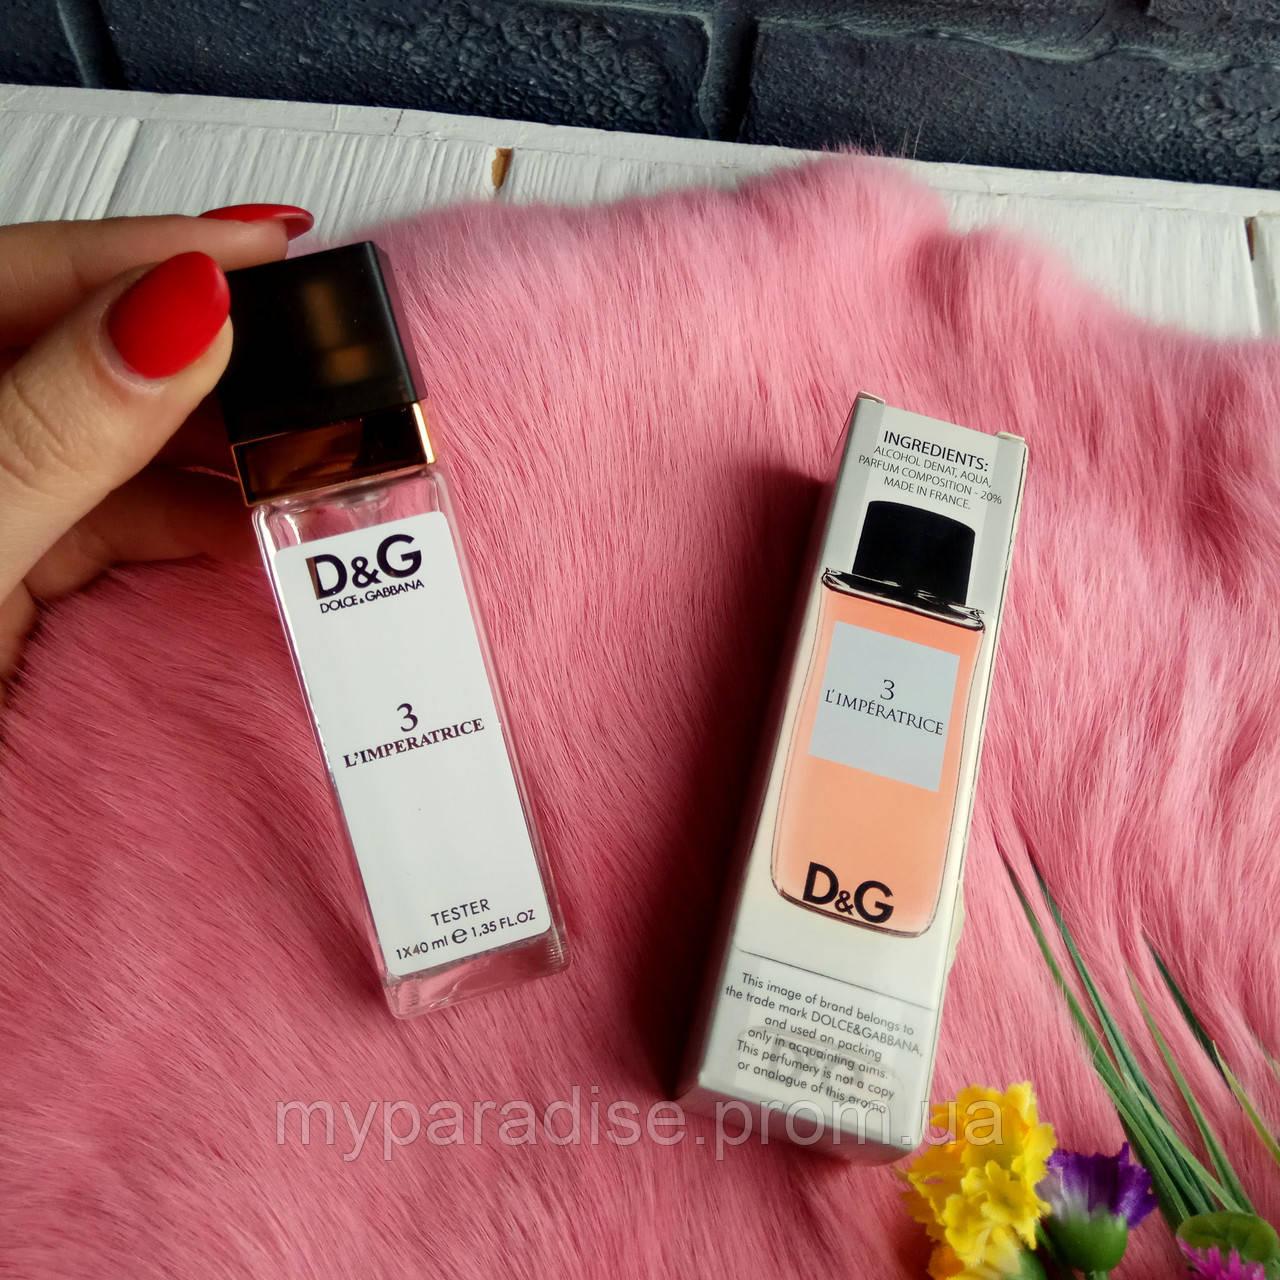 Женская туалетная вода Dolce&Gabbana 3 L'Imperatrice 40 ml. (реплика)